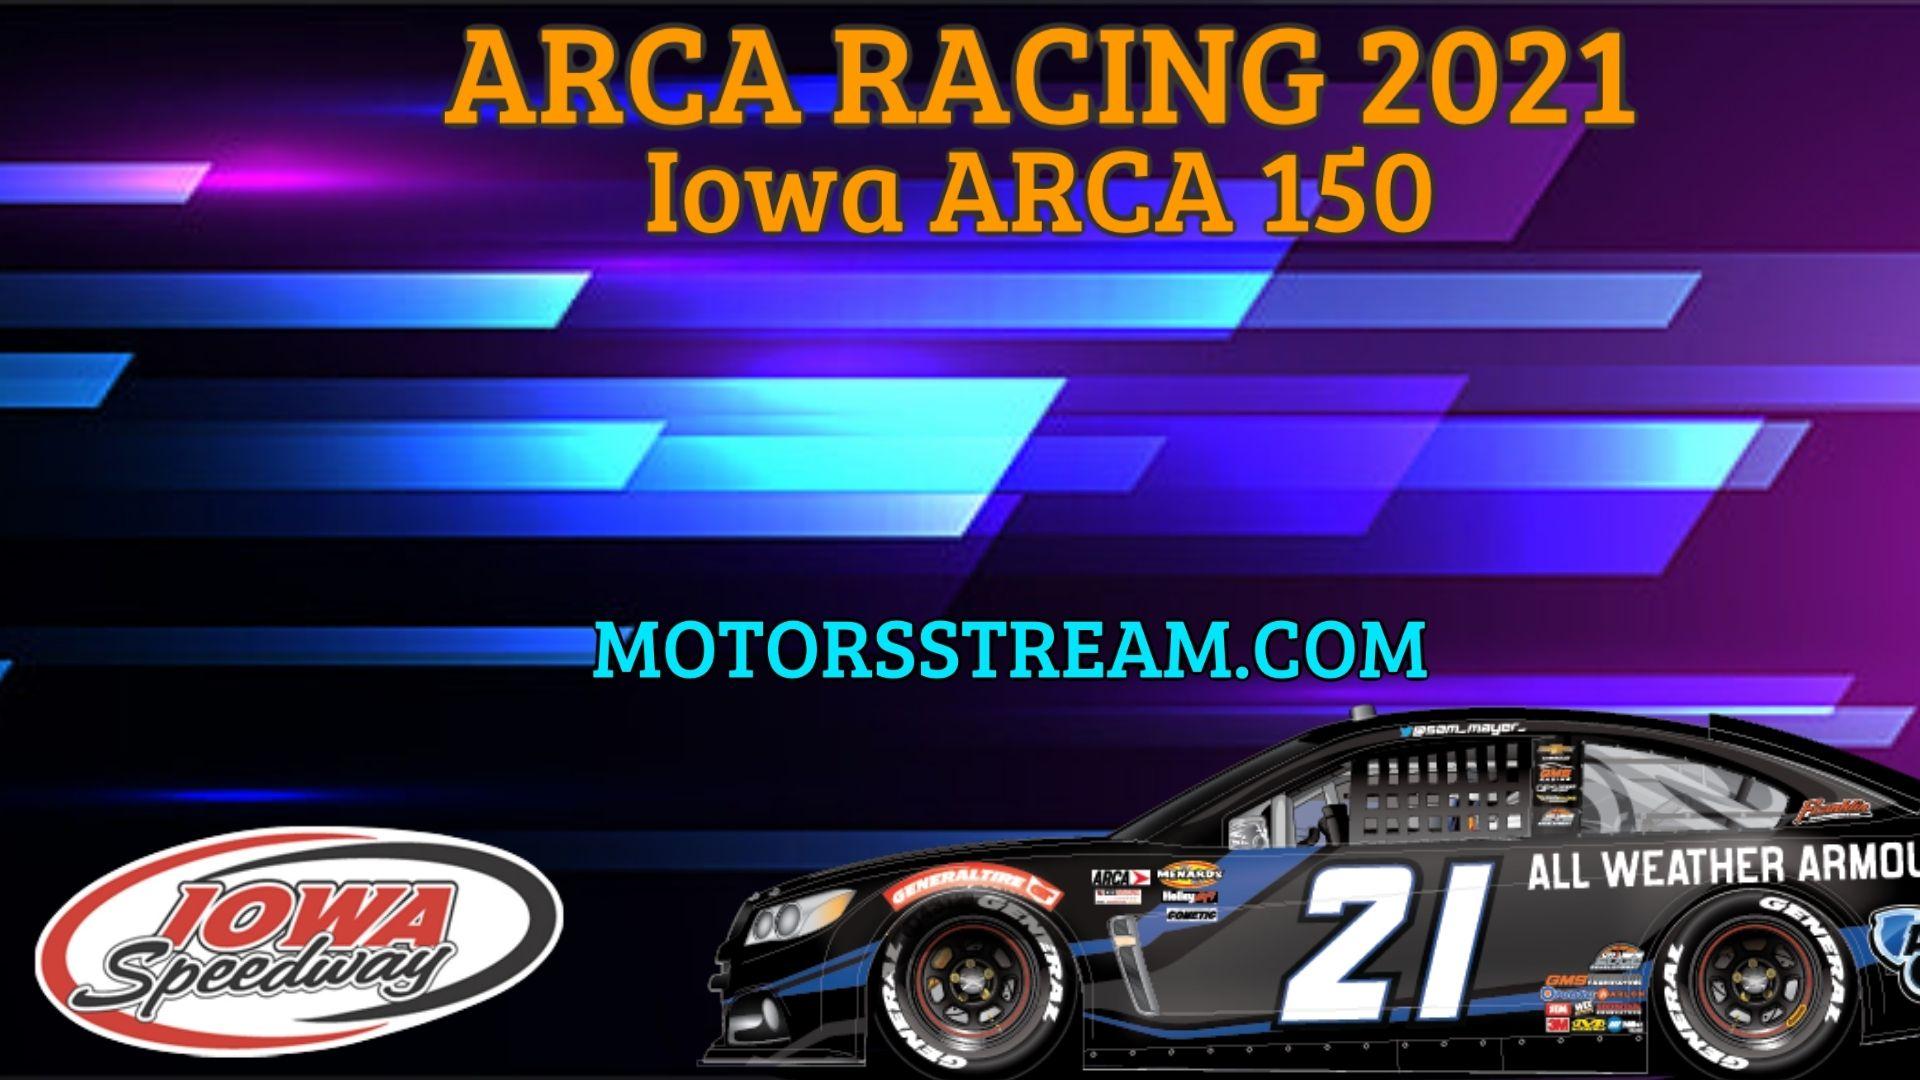 Iowa ARCA 150 Live Stream 2021 Arca Racing